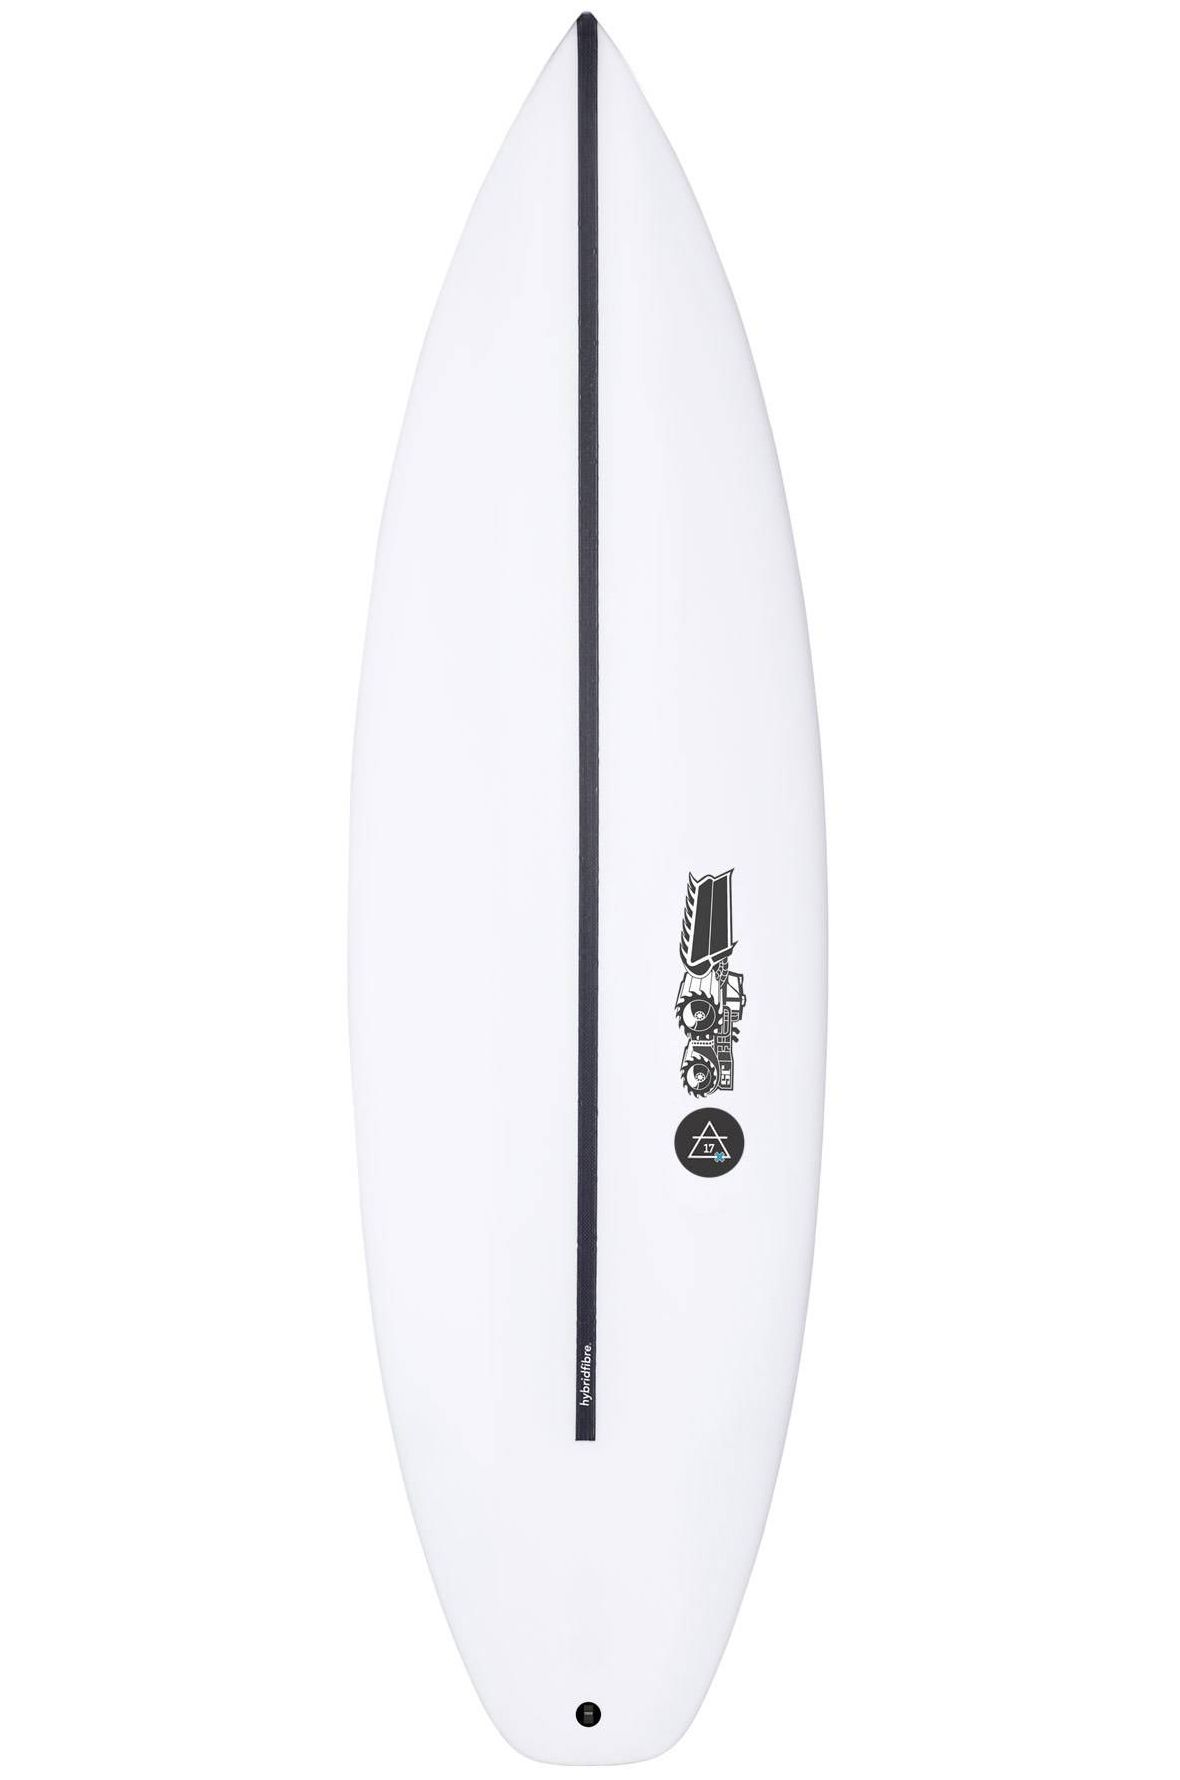 Prancha Surf JS 5'10 JULIAN AIR- 17X HYFI Squash Tail - White FCS II 5ft10